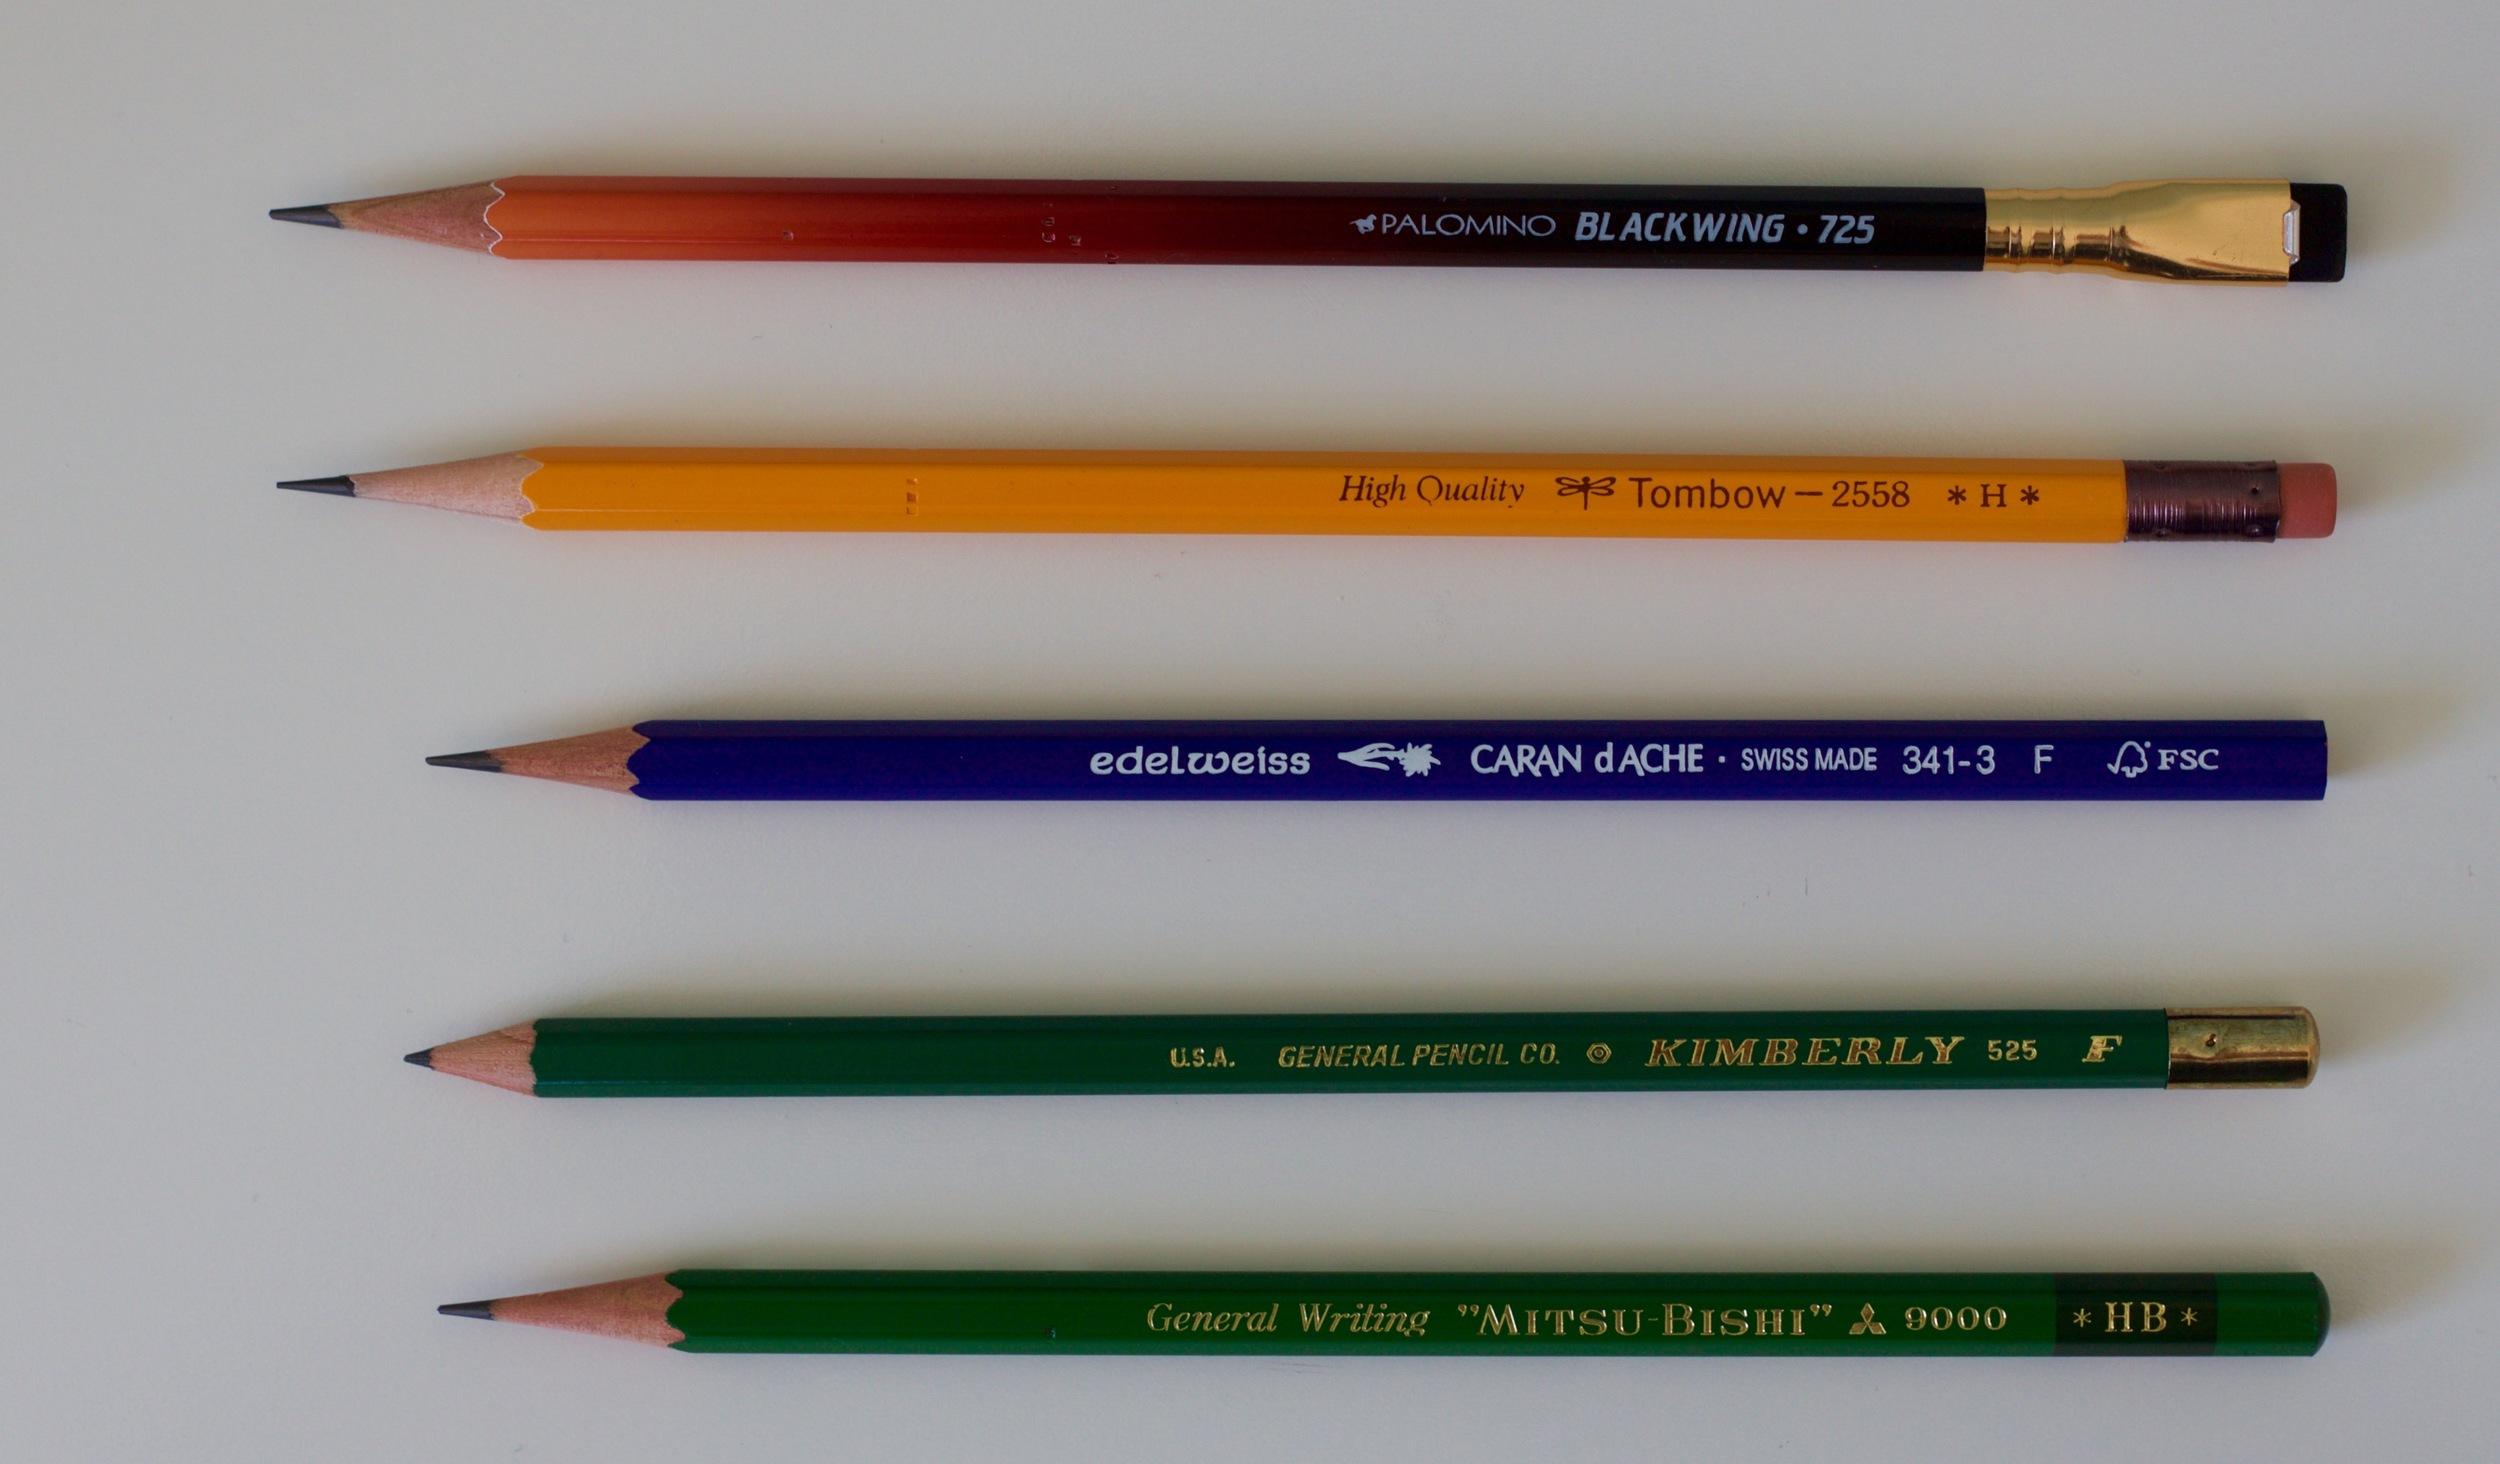 Octobers preferred pencils